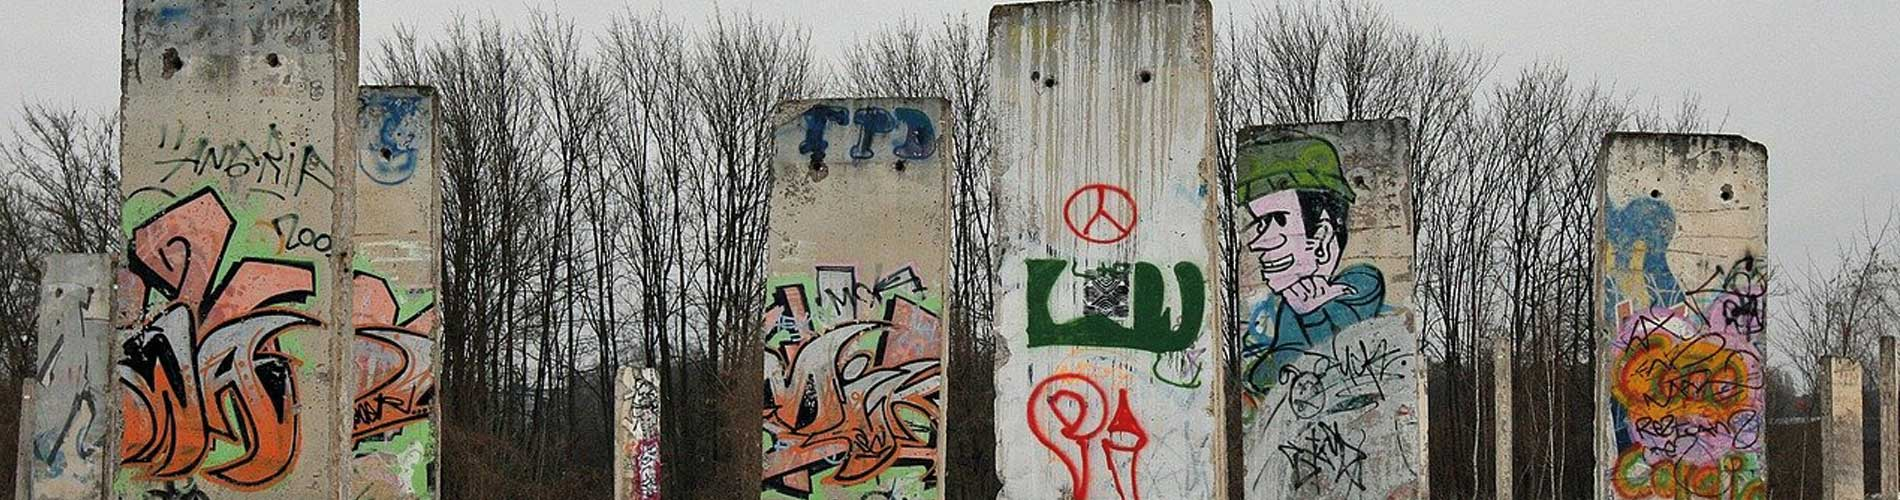 Blog_TopTenWinterBreaks_Berlin_Wall_1900x500_Q120